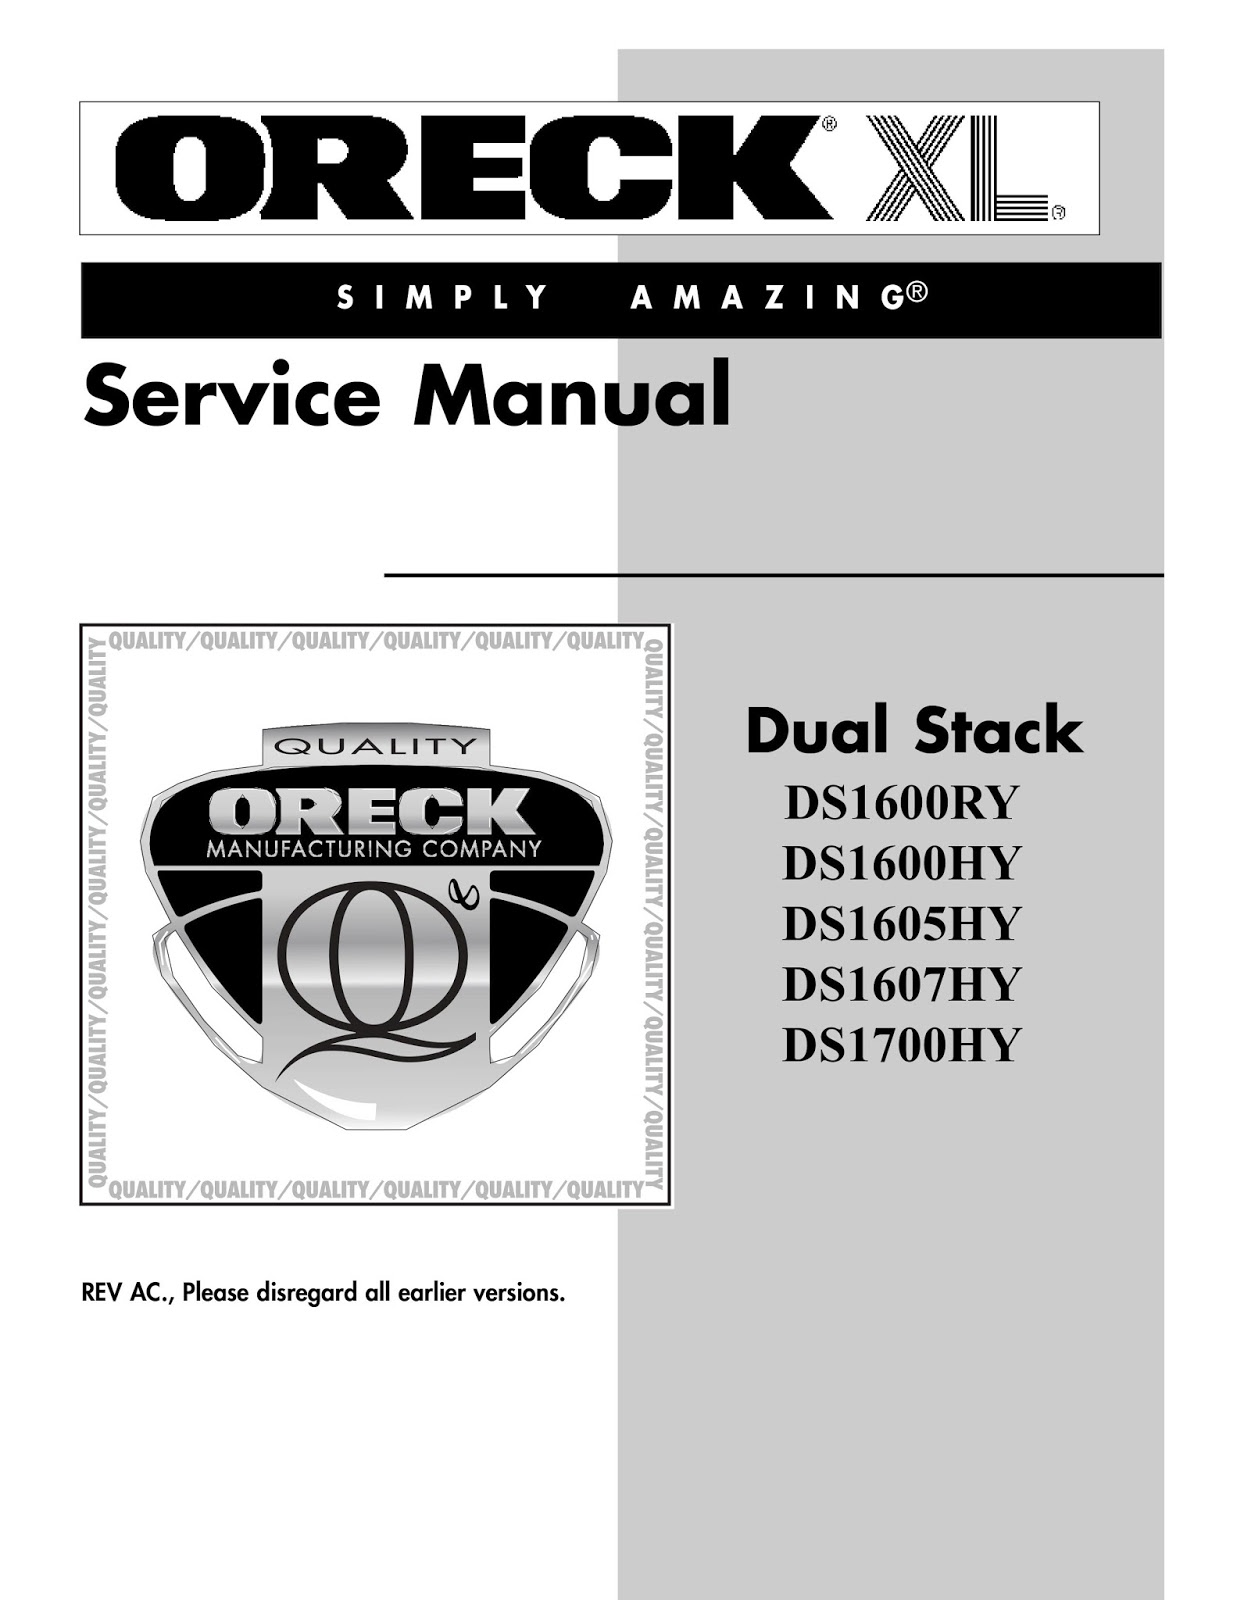 oreck dual stack service manual [ 1237 x 1600 Pixel ]